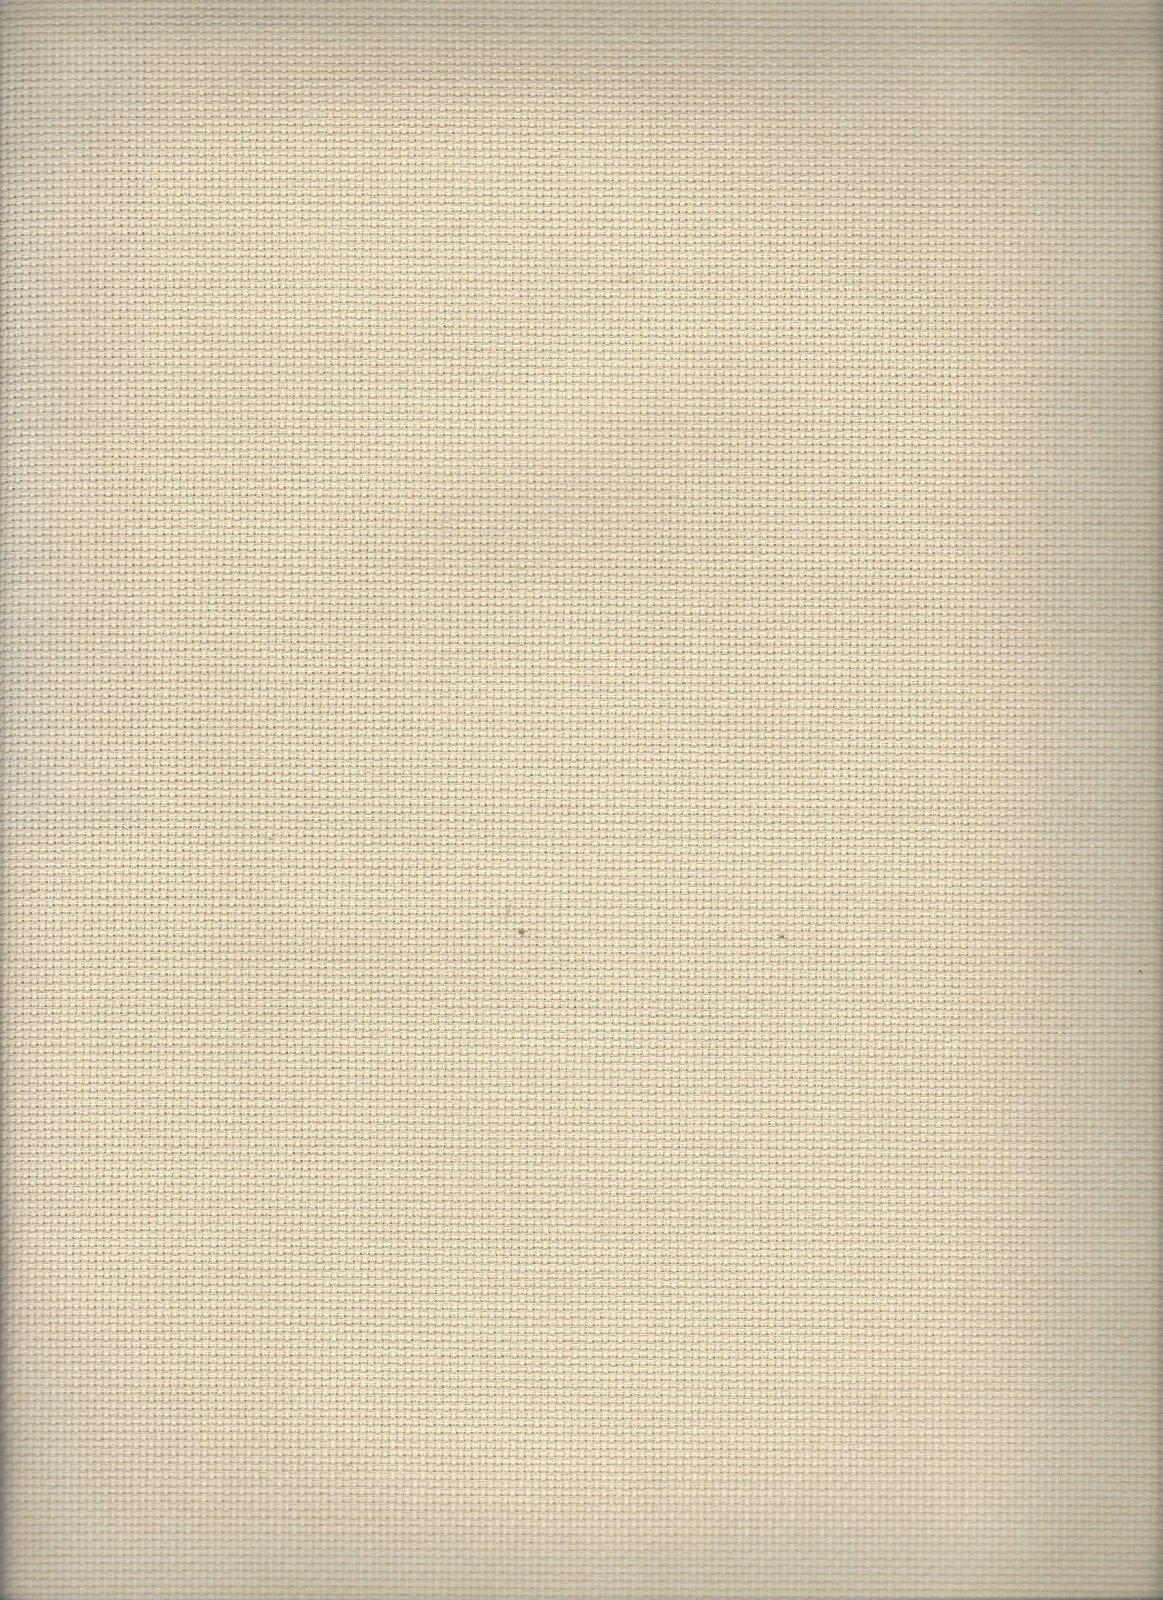 Aida 18ct Almond (discontinued color)